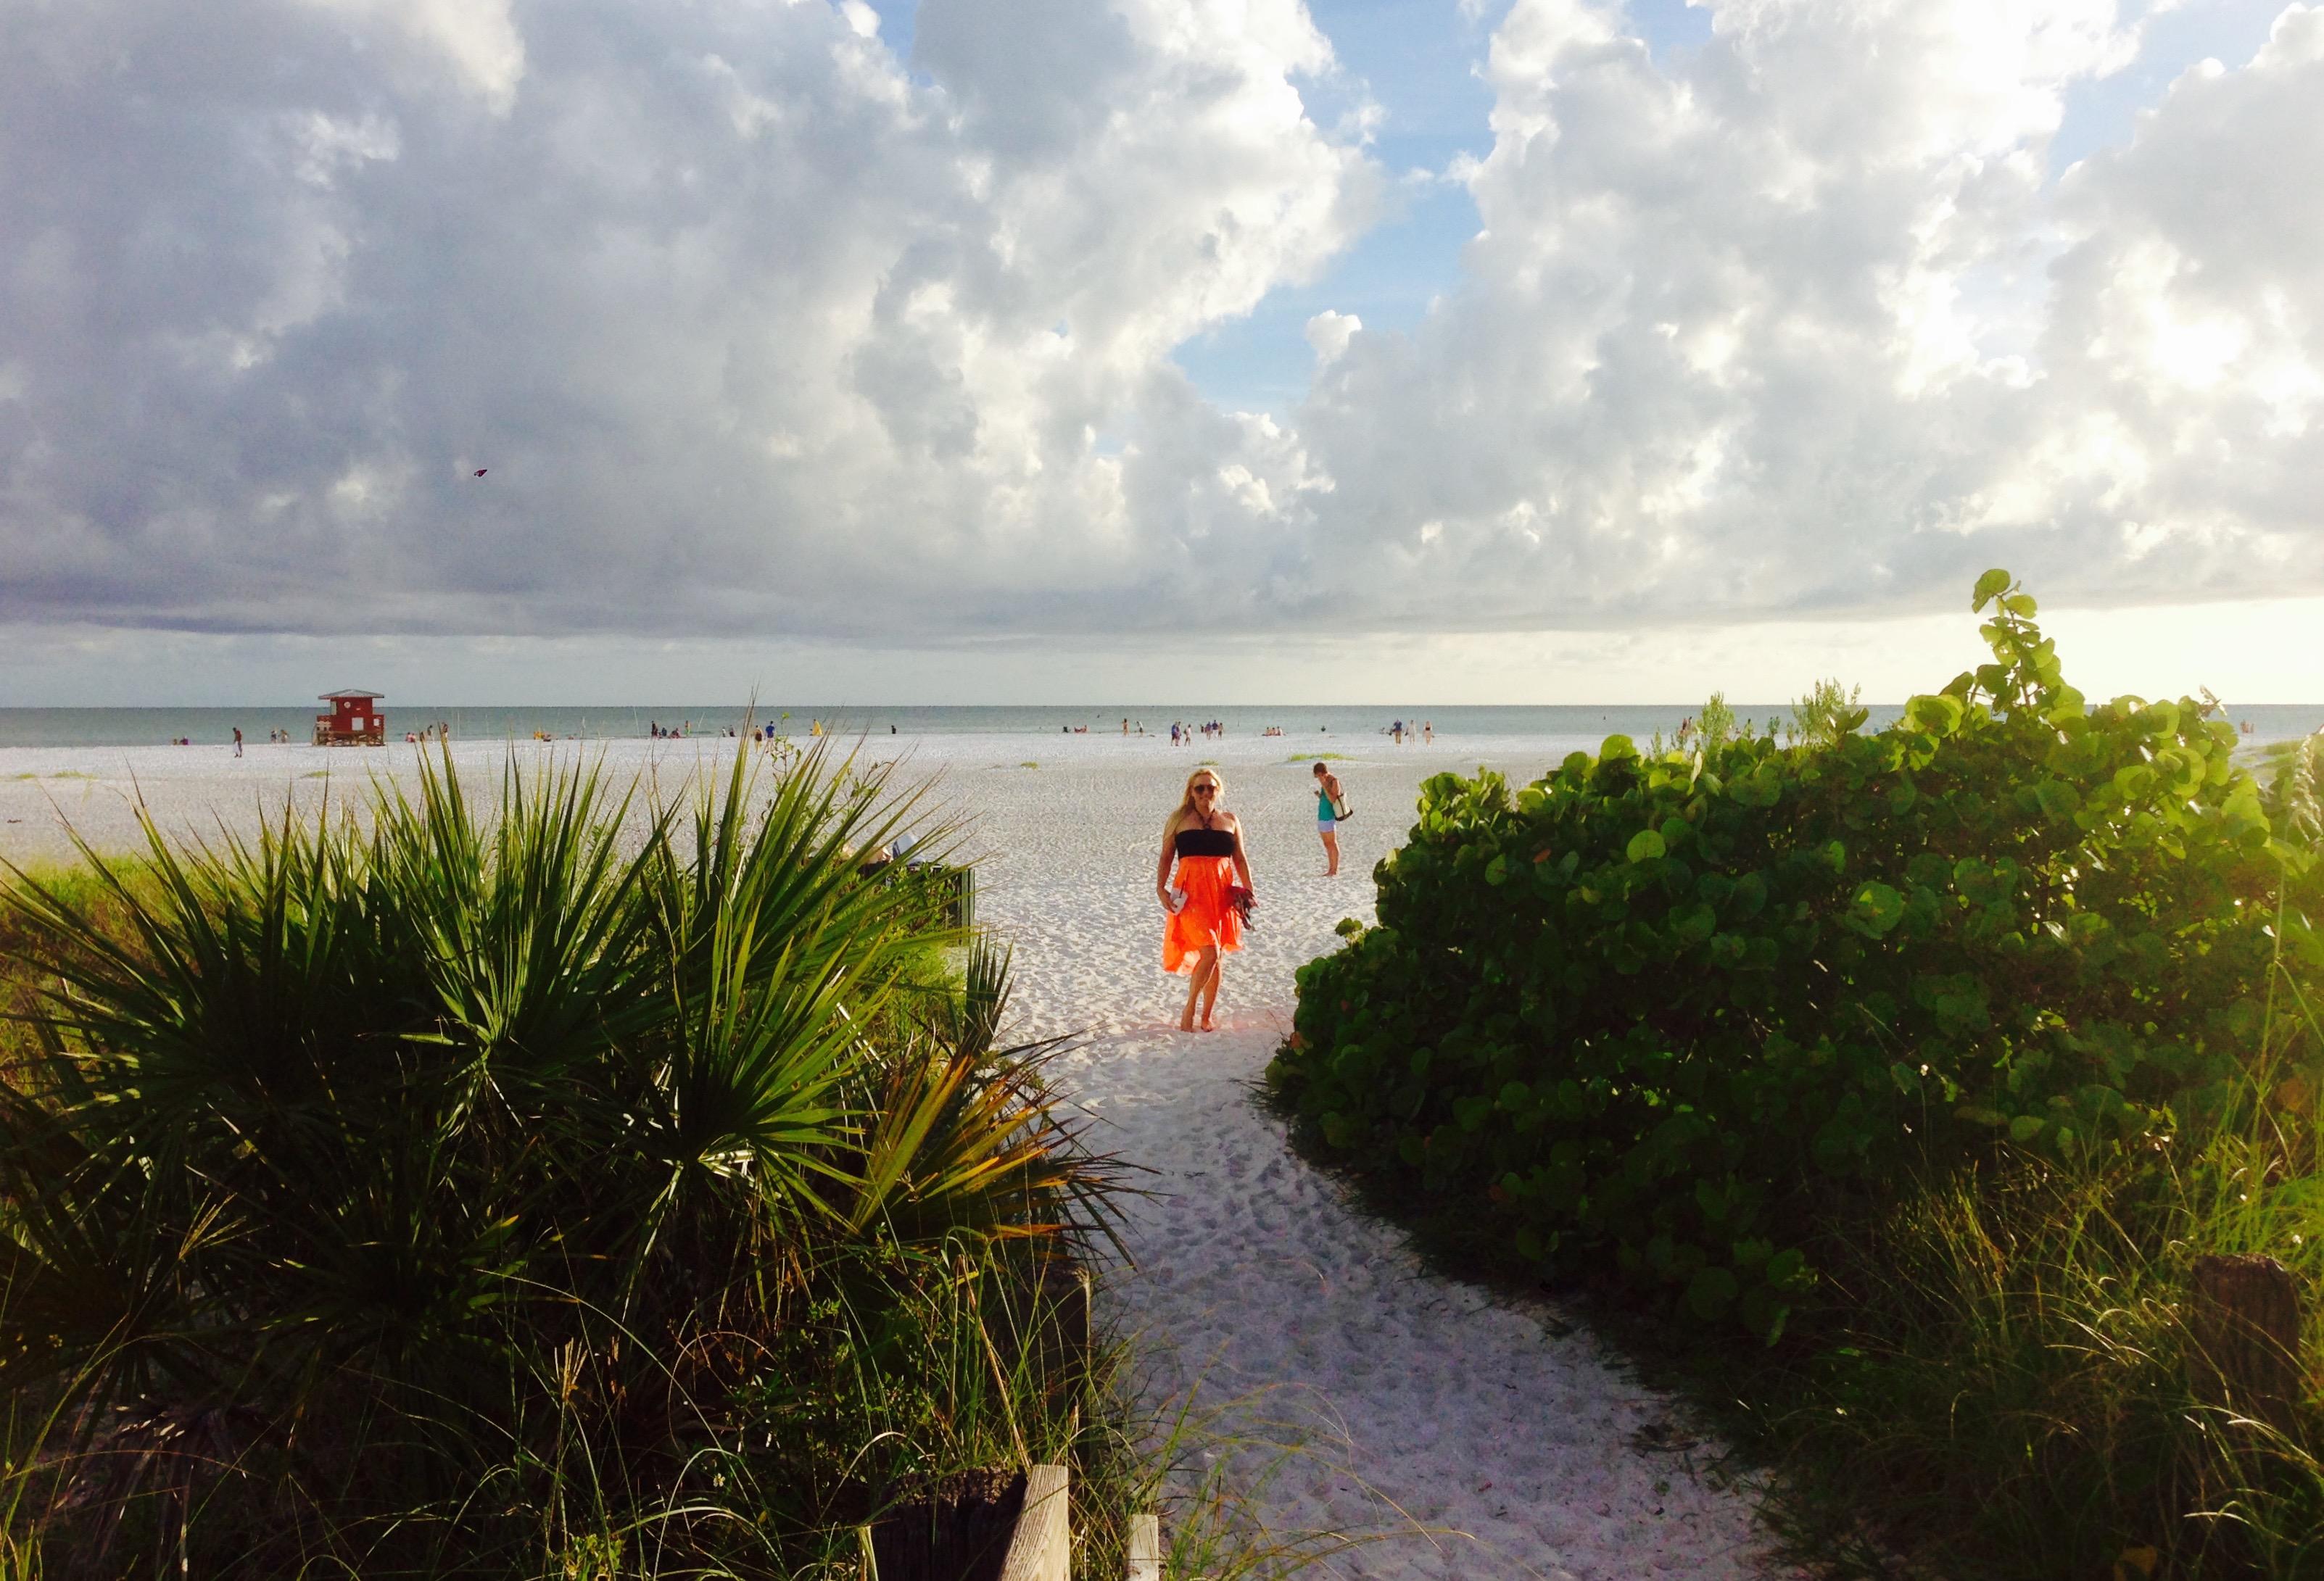 DeAnna Greenhaw at the Siesta Key Beach Entrance